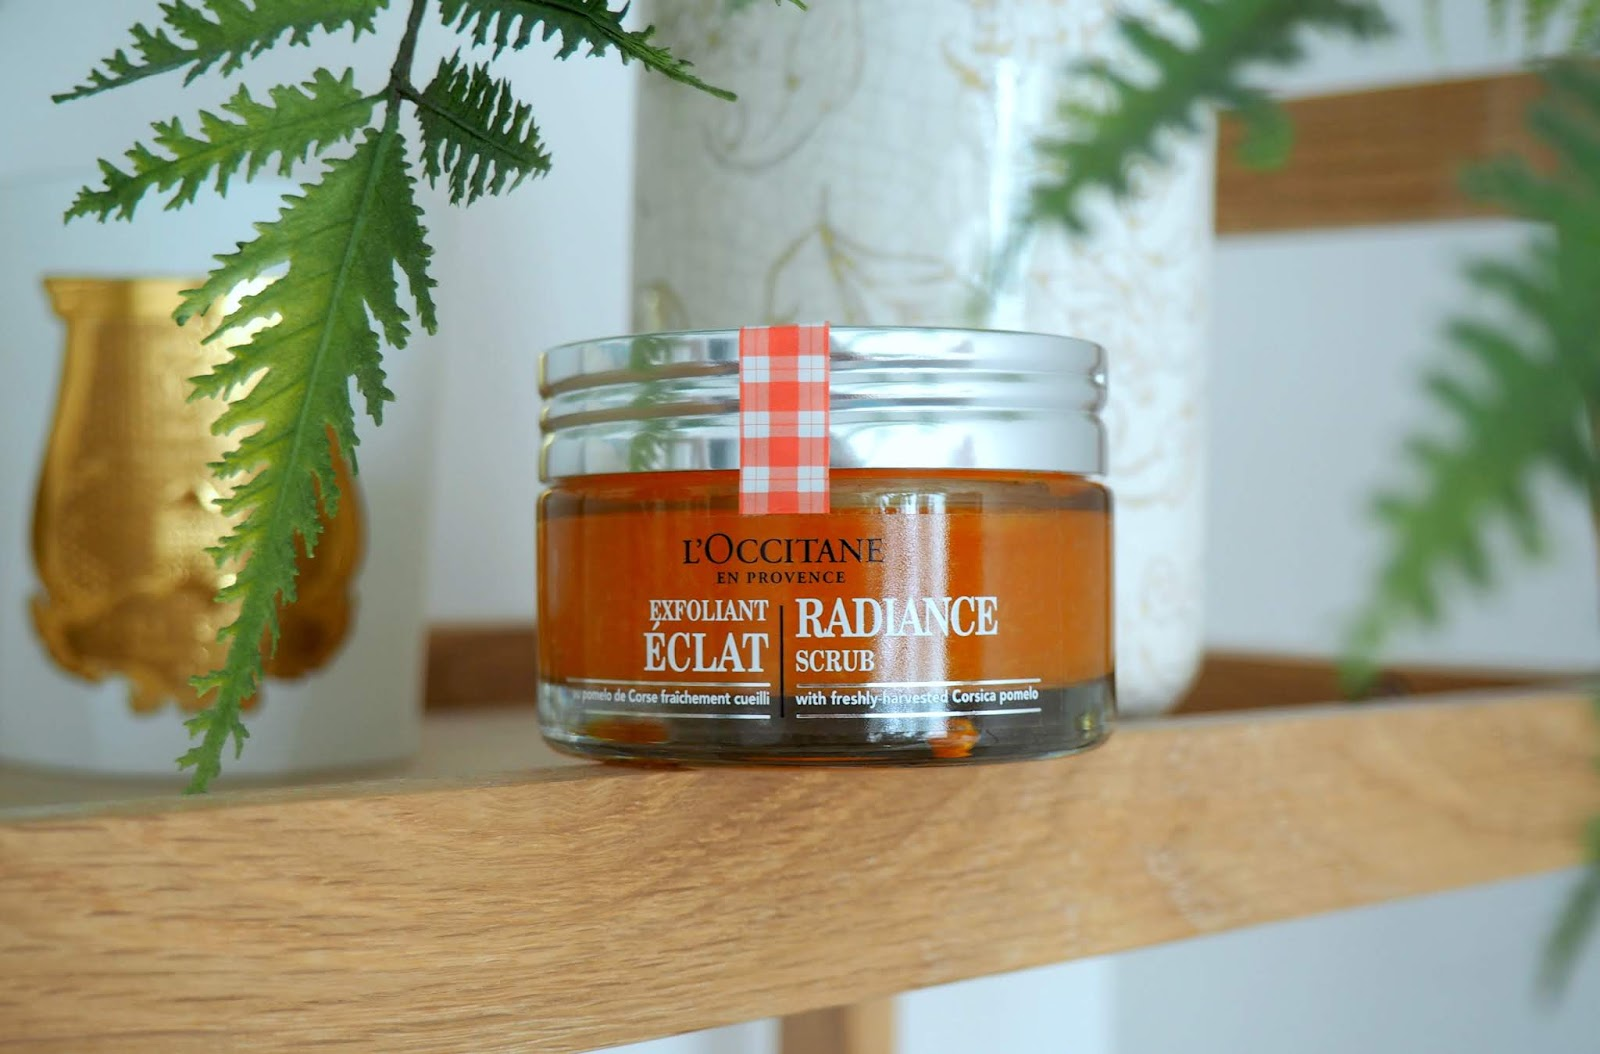 L'Occitane-Radiance-Scrub-review